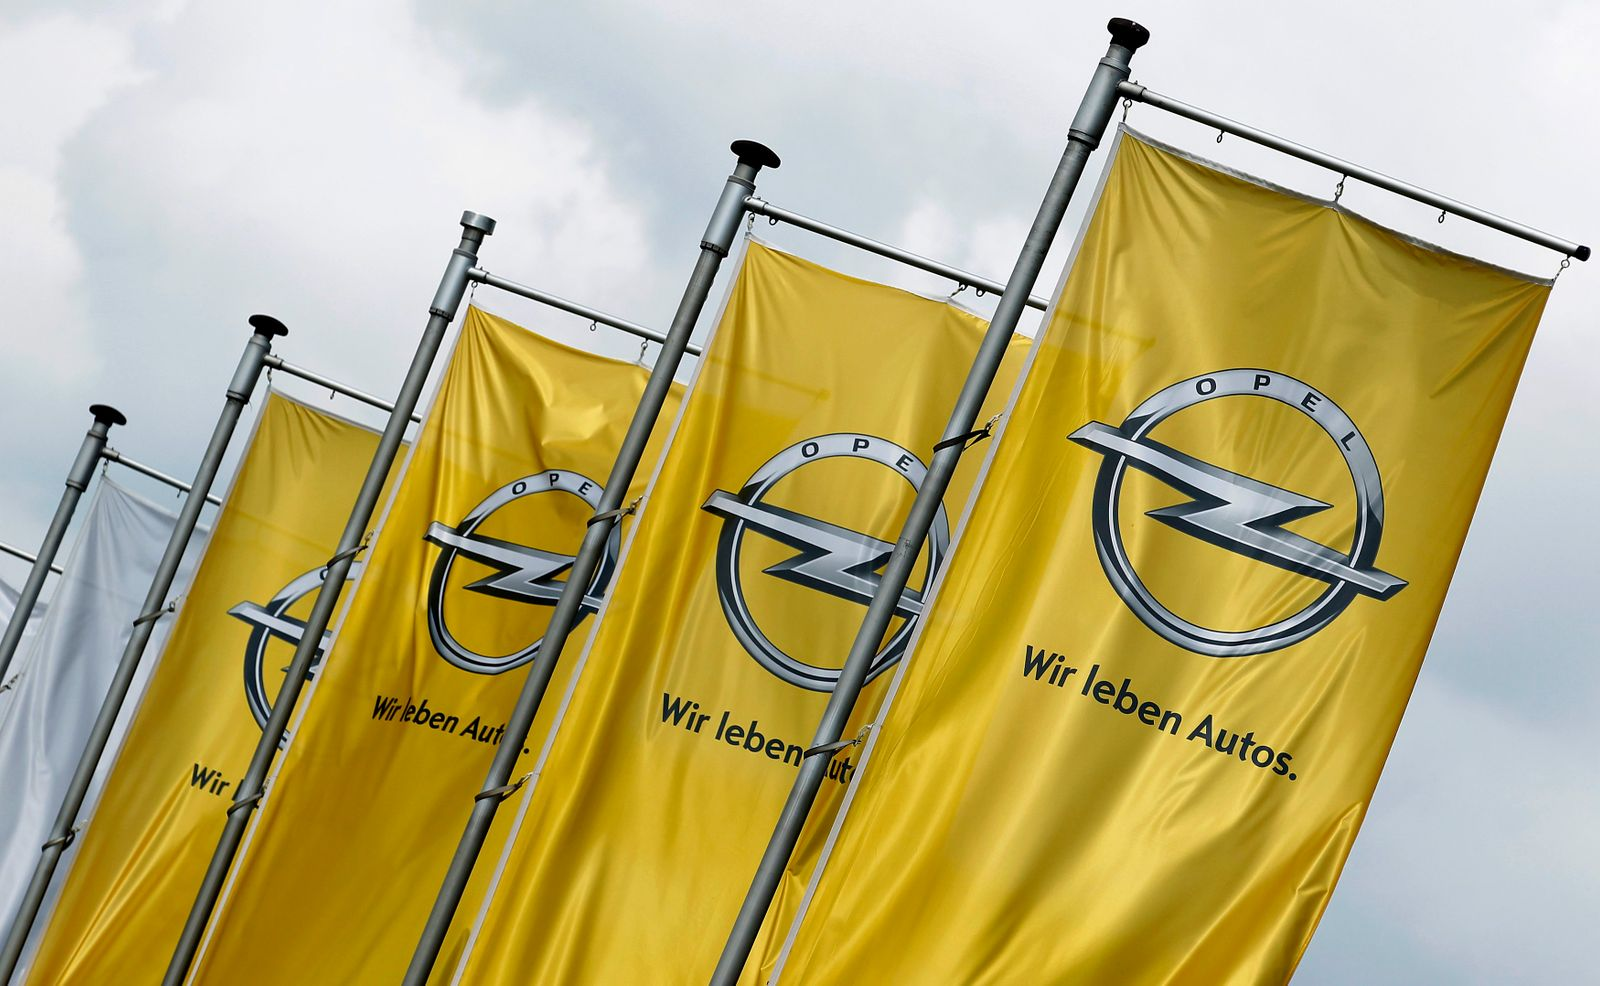 Flags of German car manufacturer Opel flutter in the wind outside headquarters in Ruesselsheim